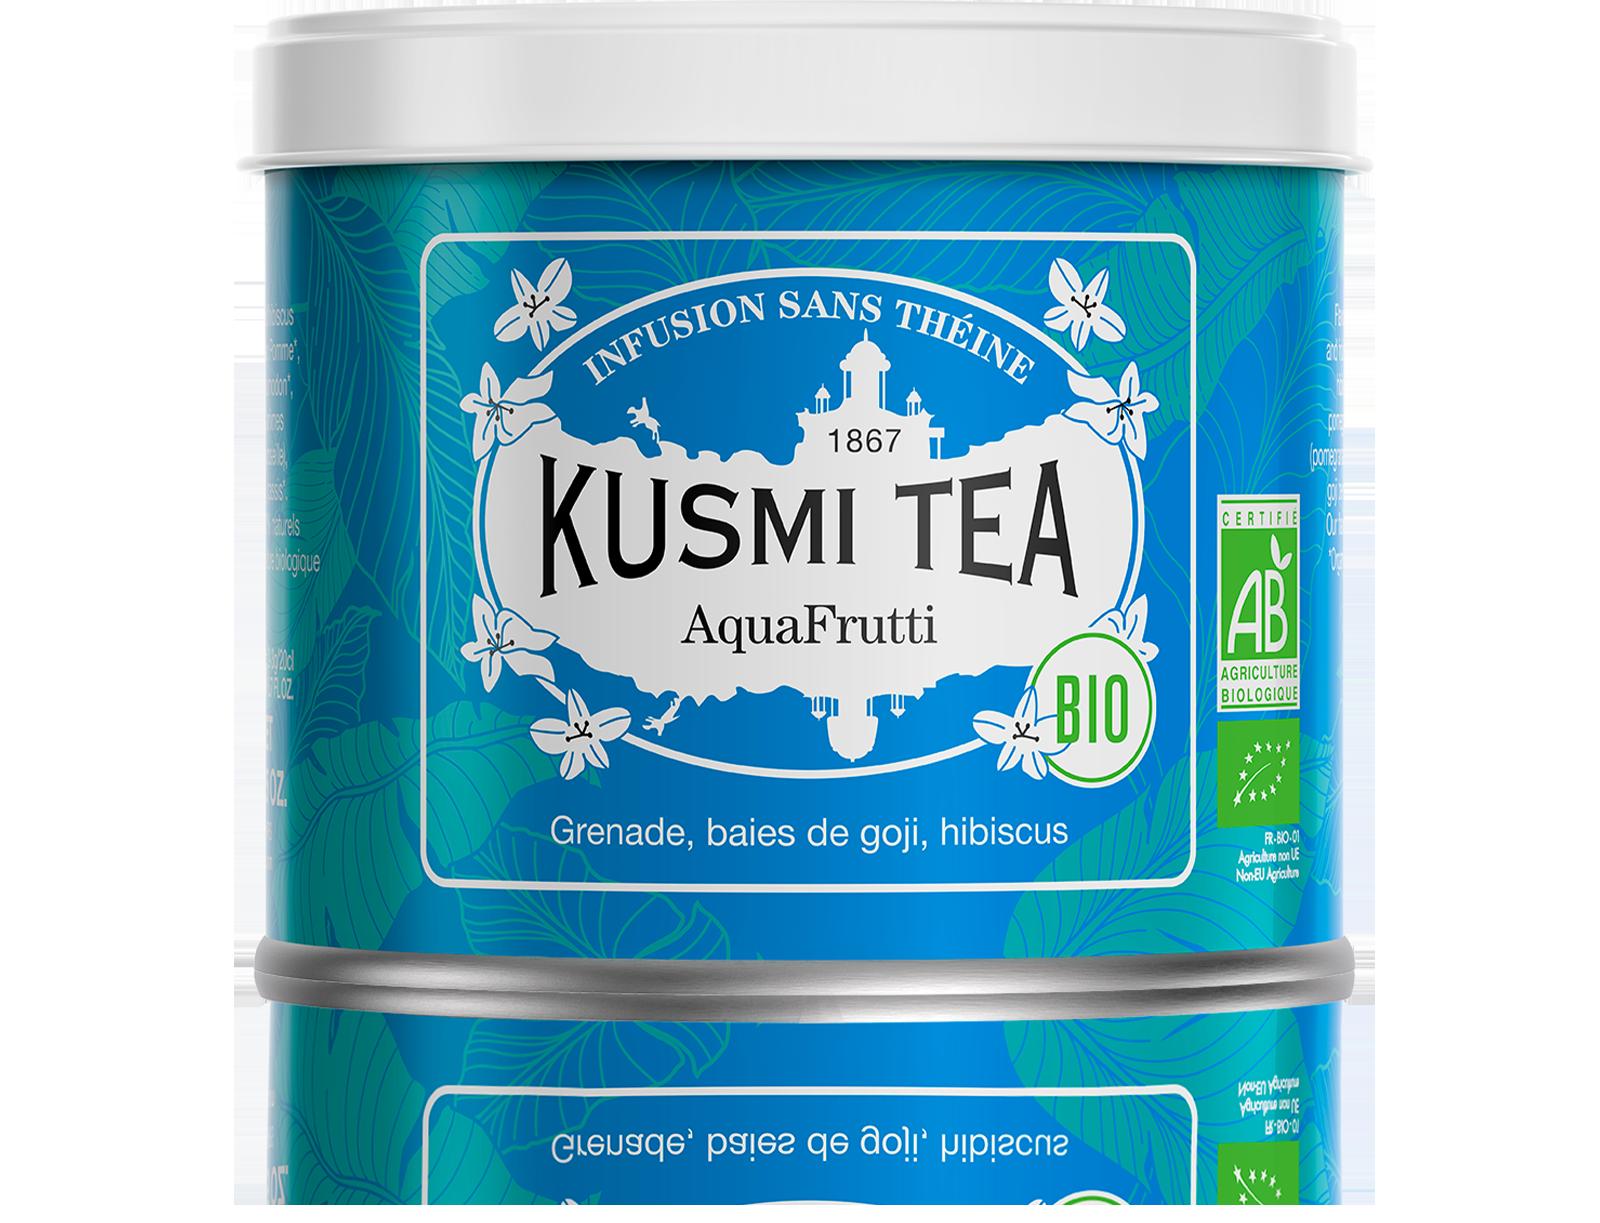 Infusion d'hibiscus bio - AquaFrutti (Infusion de fruits bio) - Vrac - Kusmi Tea